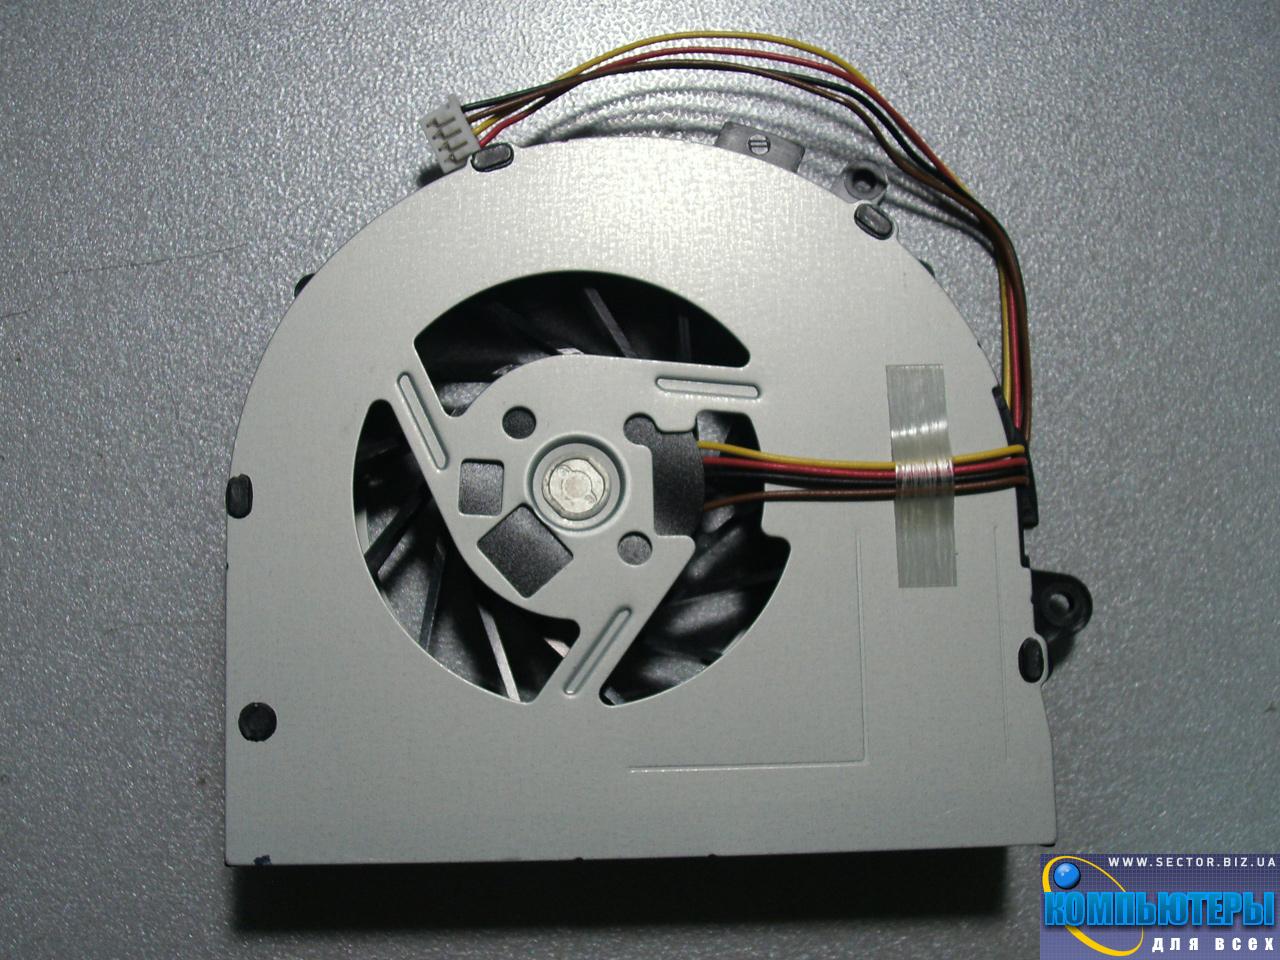 Кулер к ноутбуку Lenovo G480 G485 G580 G585 vers.1 p/n: UDQFLJP04DCM 3219Q2. Фото № 4.